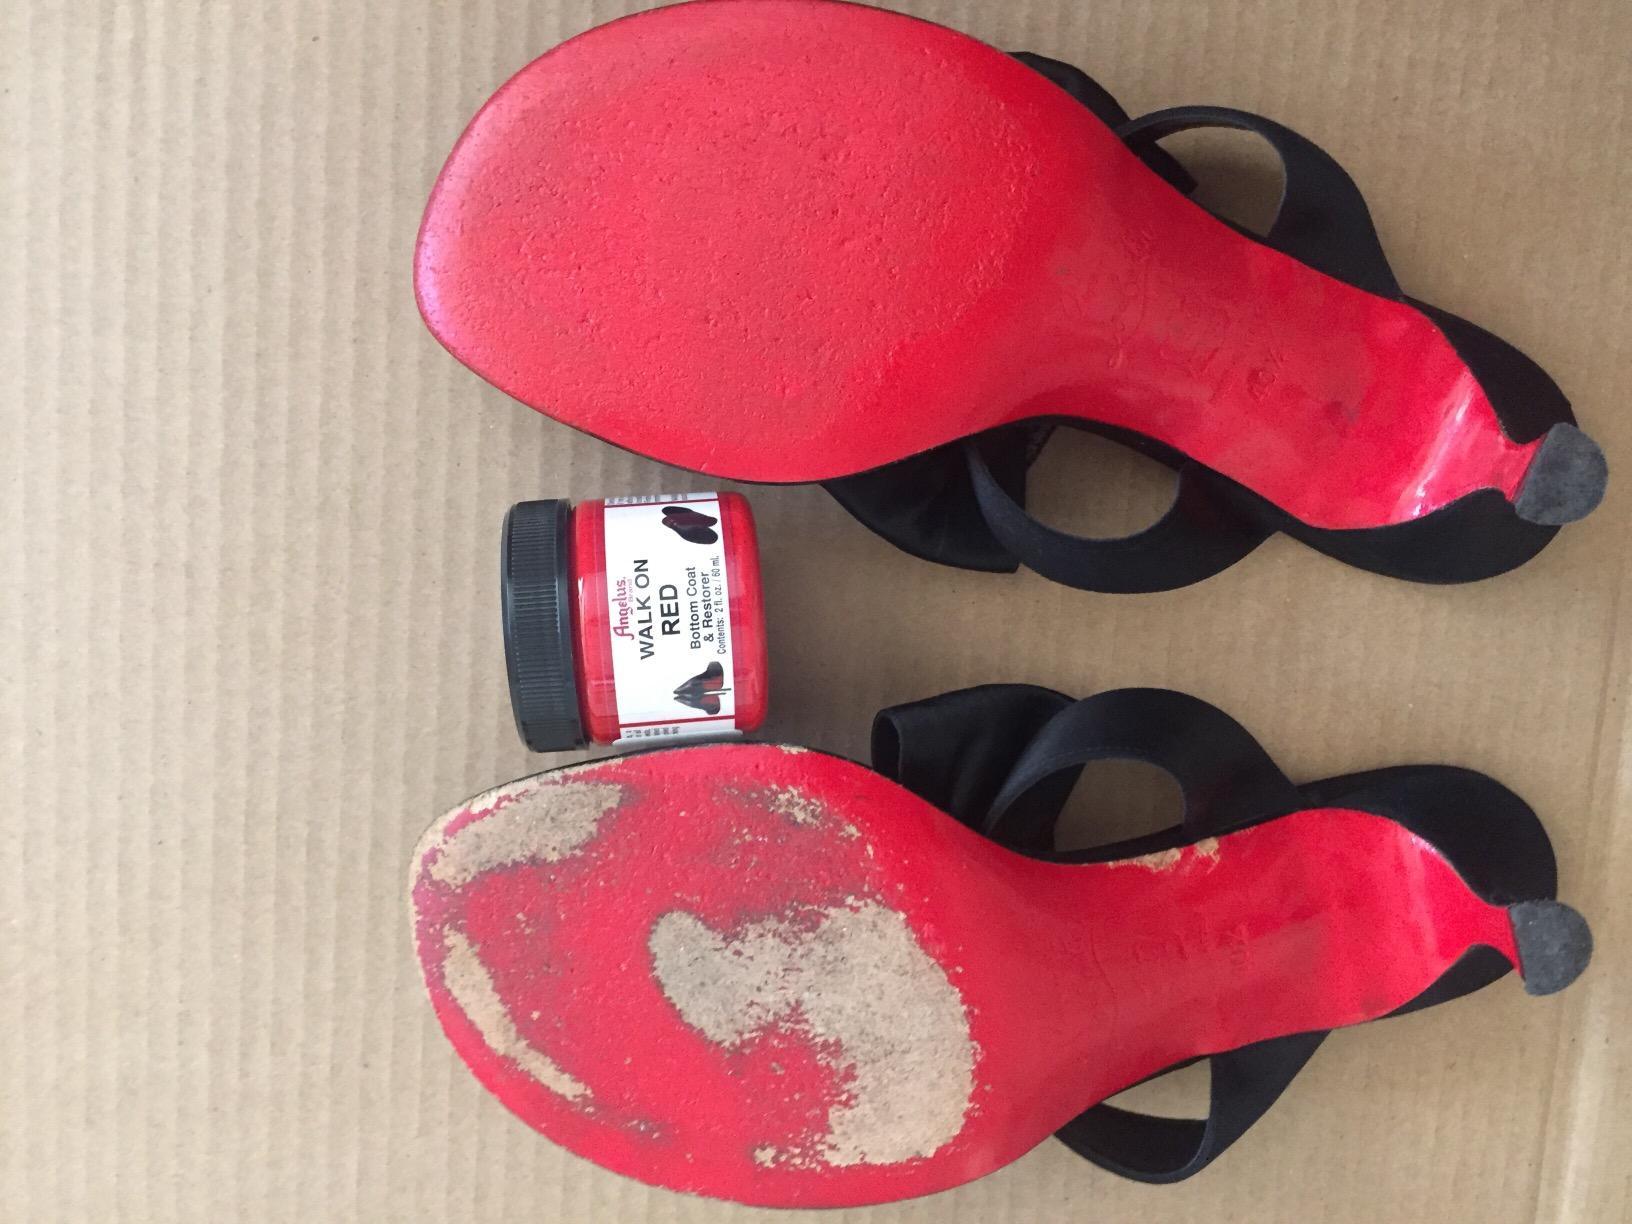 b1e8a672517 Angelus Shoe Bottom Coat and Restorer - 2 Ounces - Amazon Mỹ   Fado.vn